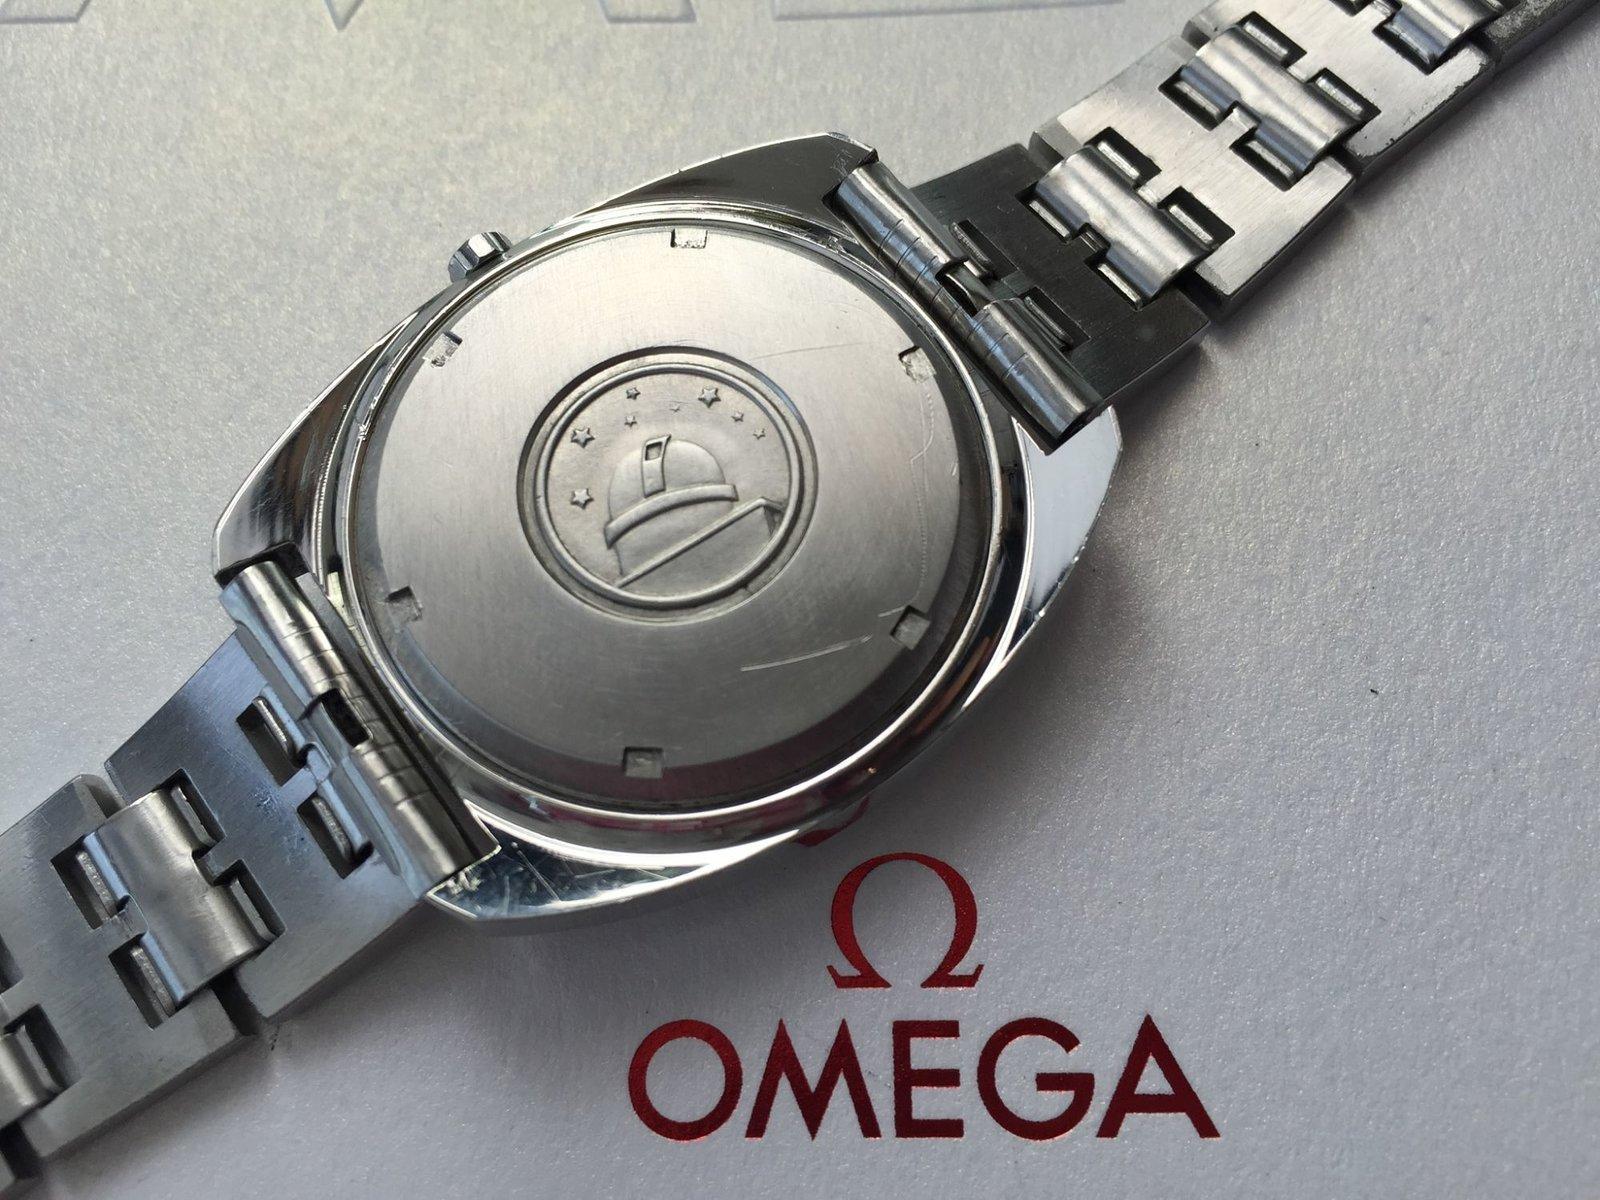 Omega const. baksida.jpg